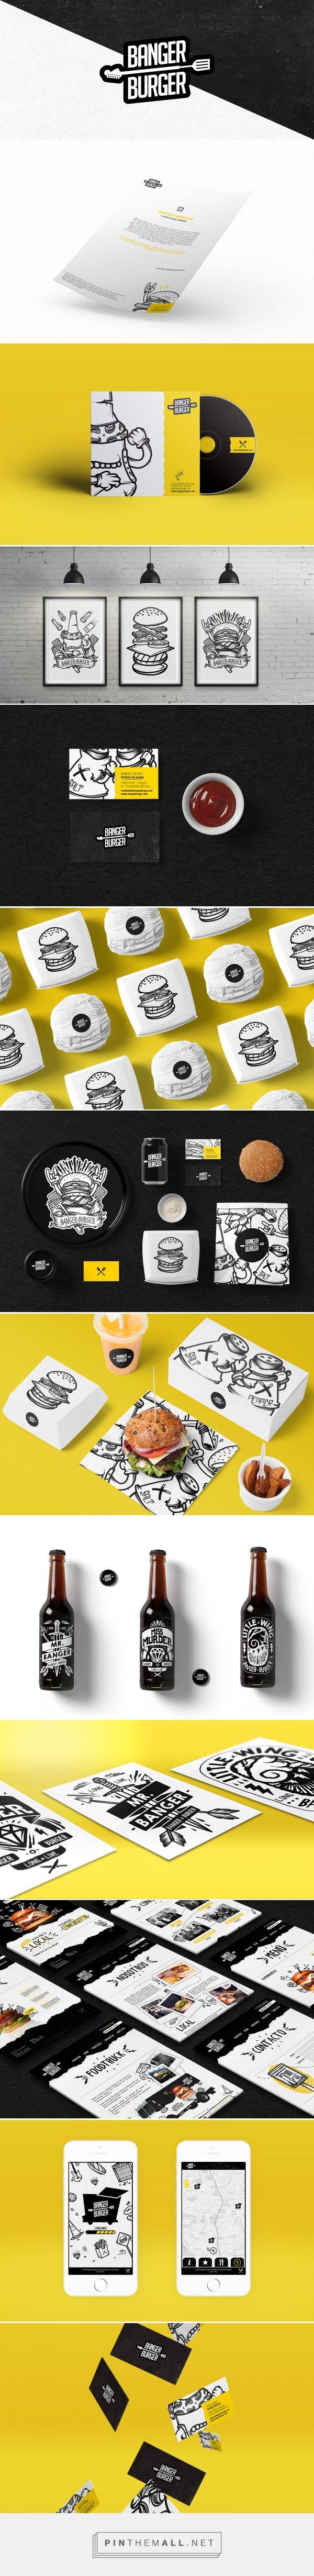 Banger Burger Restaurant Branding by Kevin Huarac                                                                                                                                                                                 Más